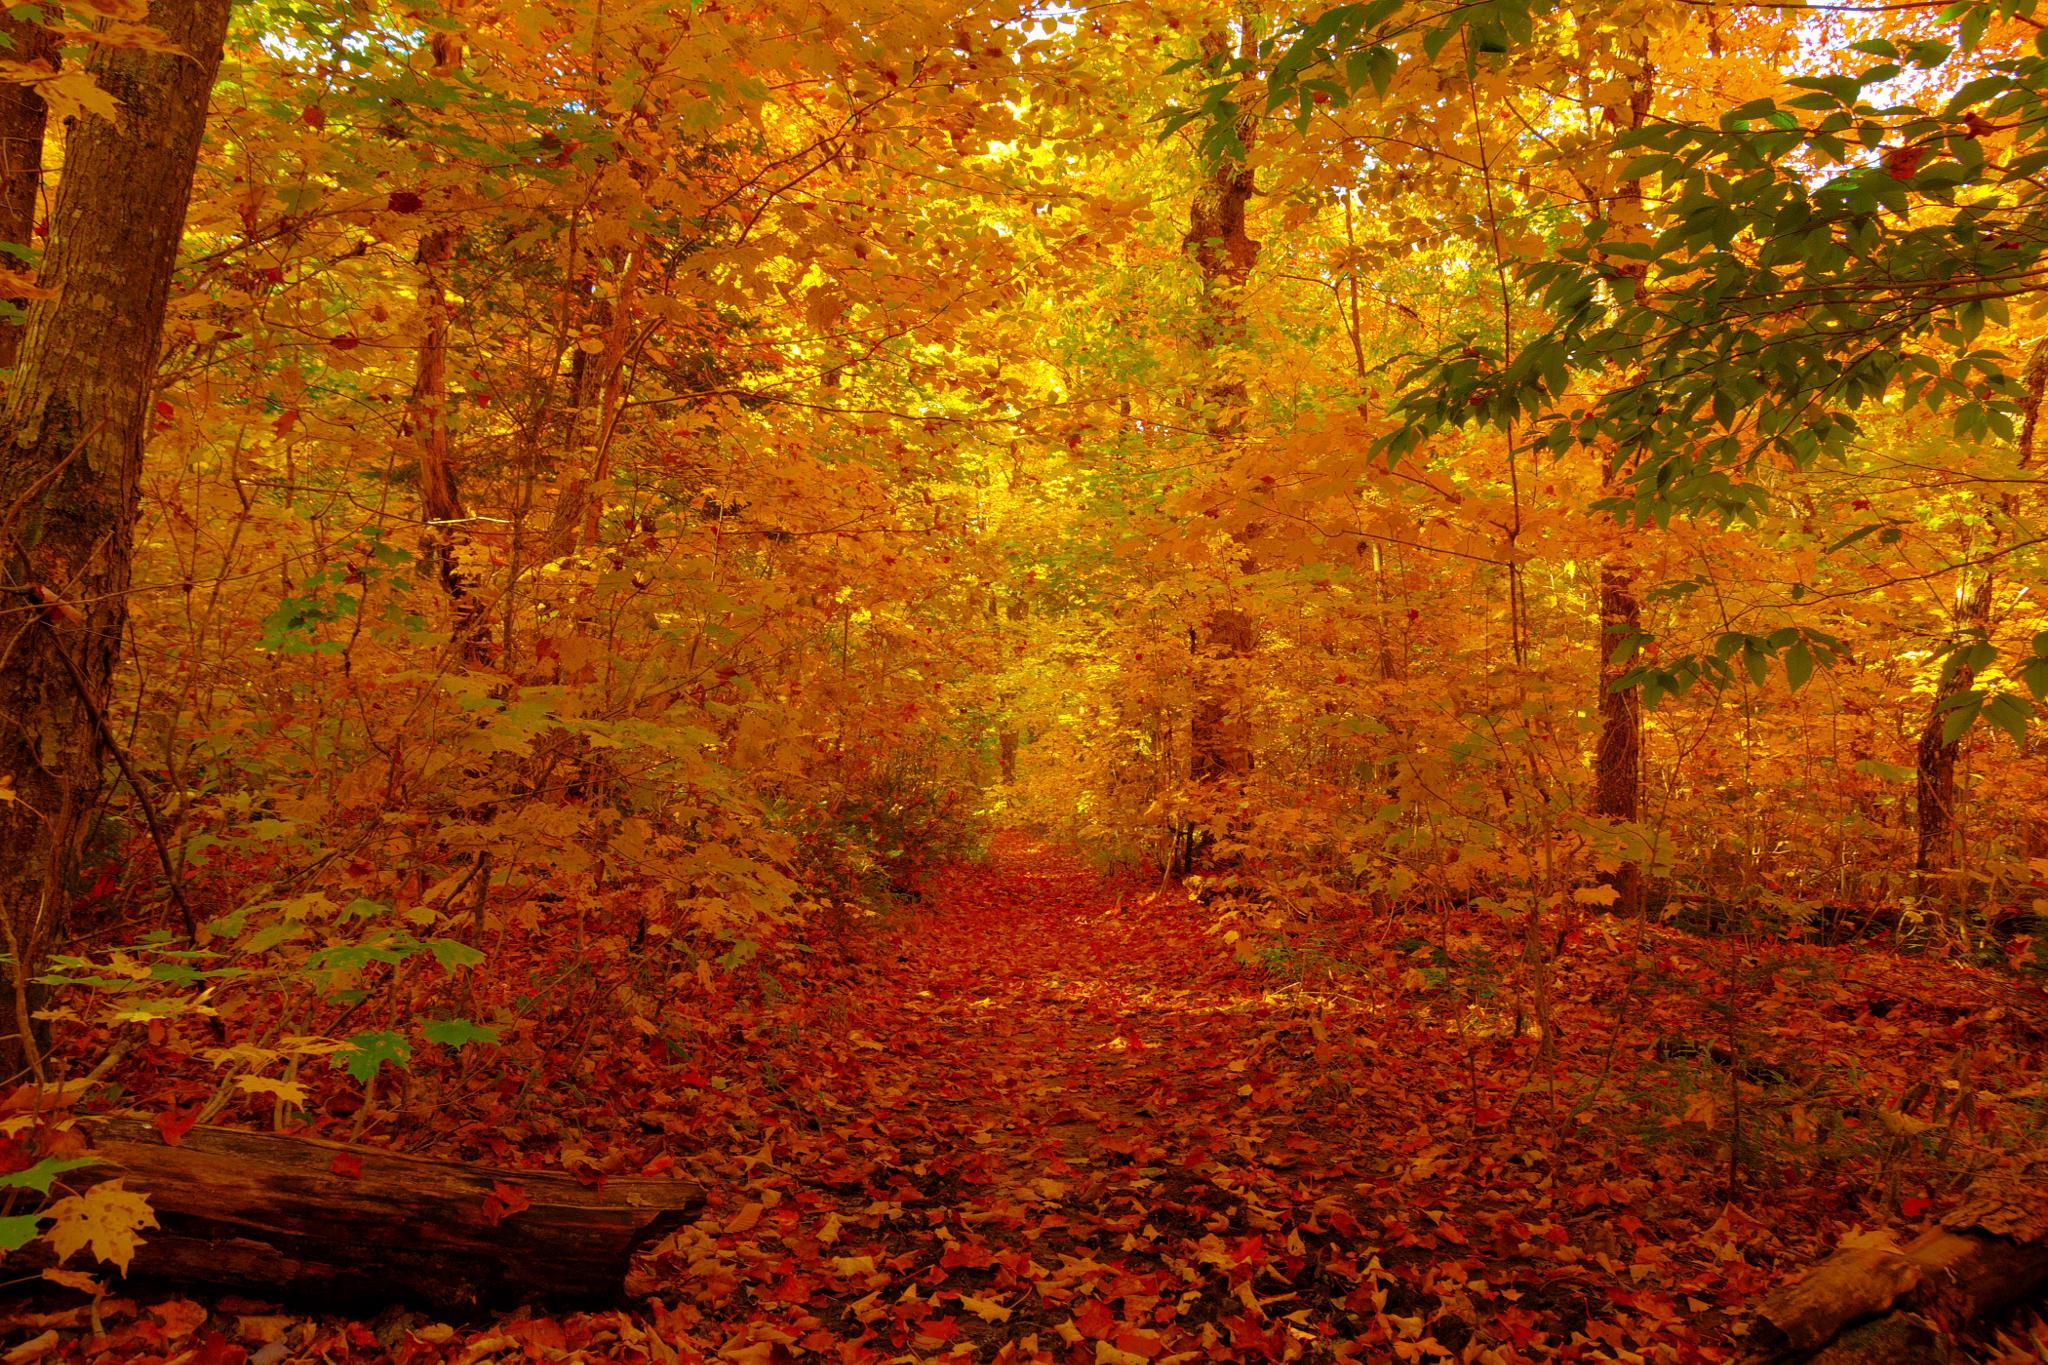 Carpet Of Leaves by Tim Corner